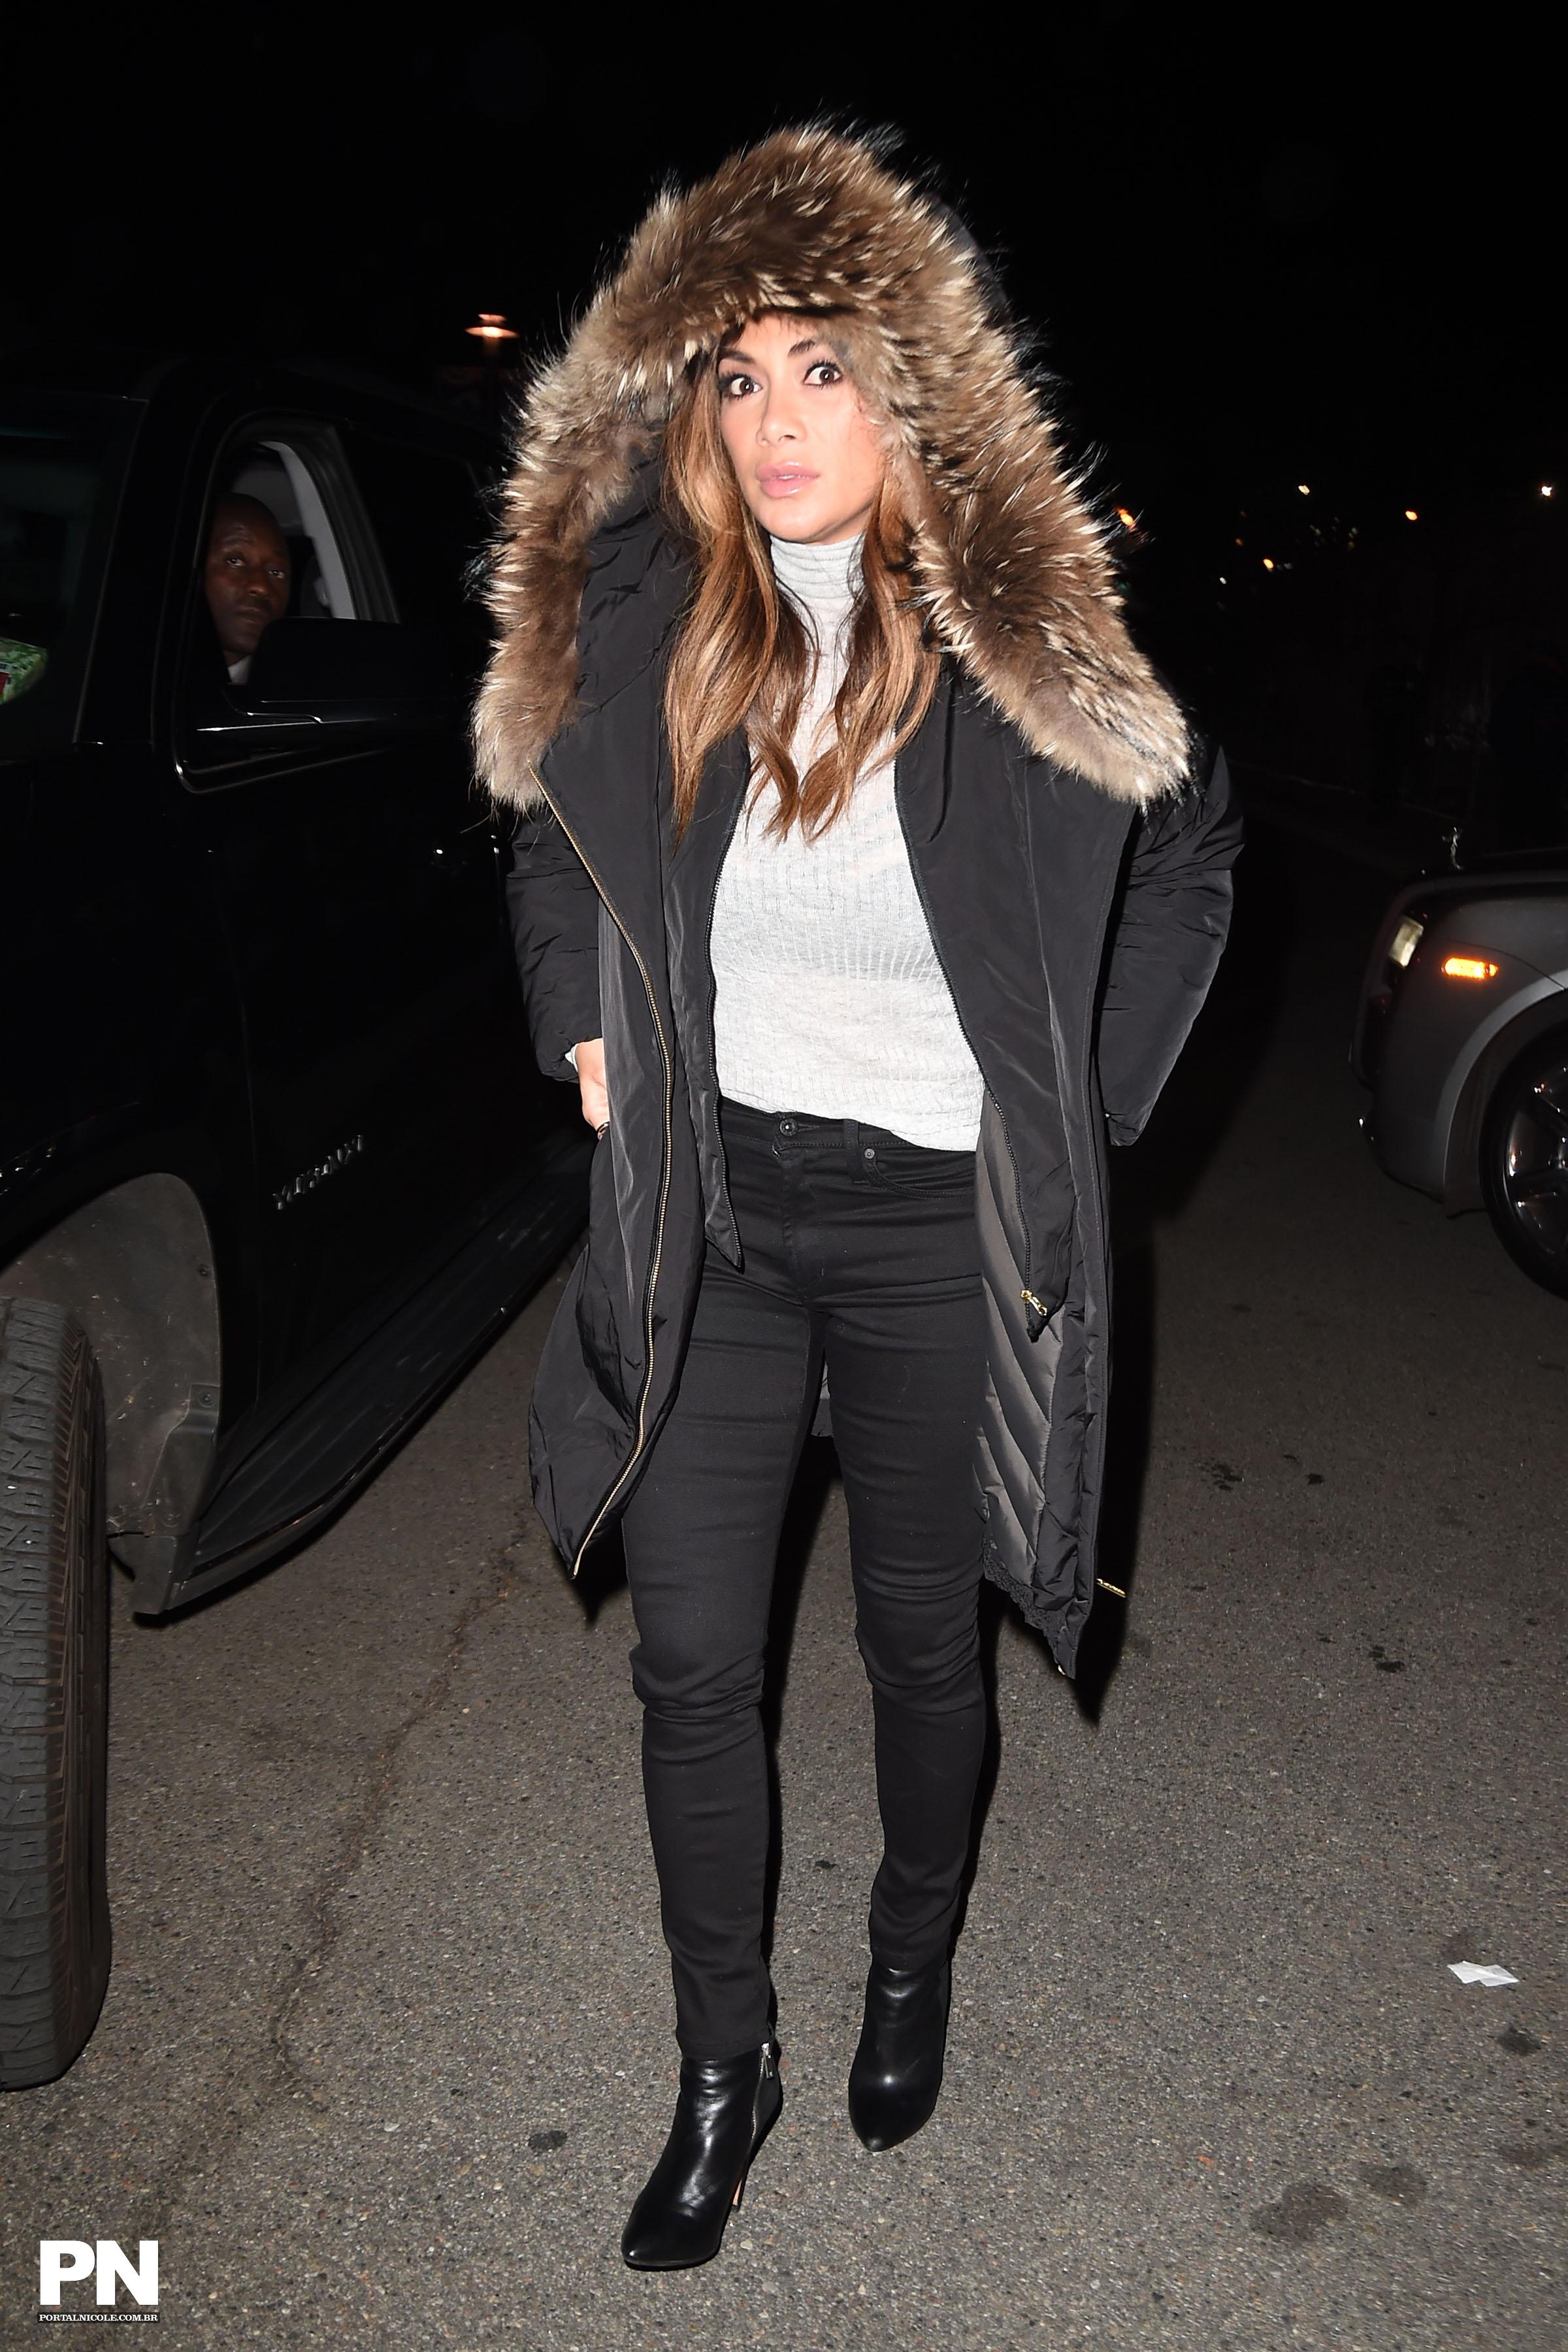 Nicole Scherzinger >> Candids/Apariciones/Shoots - Página 11 002